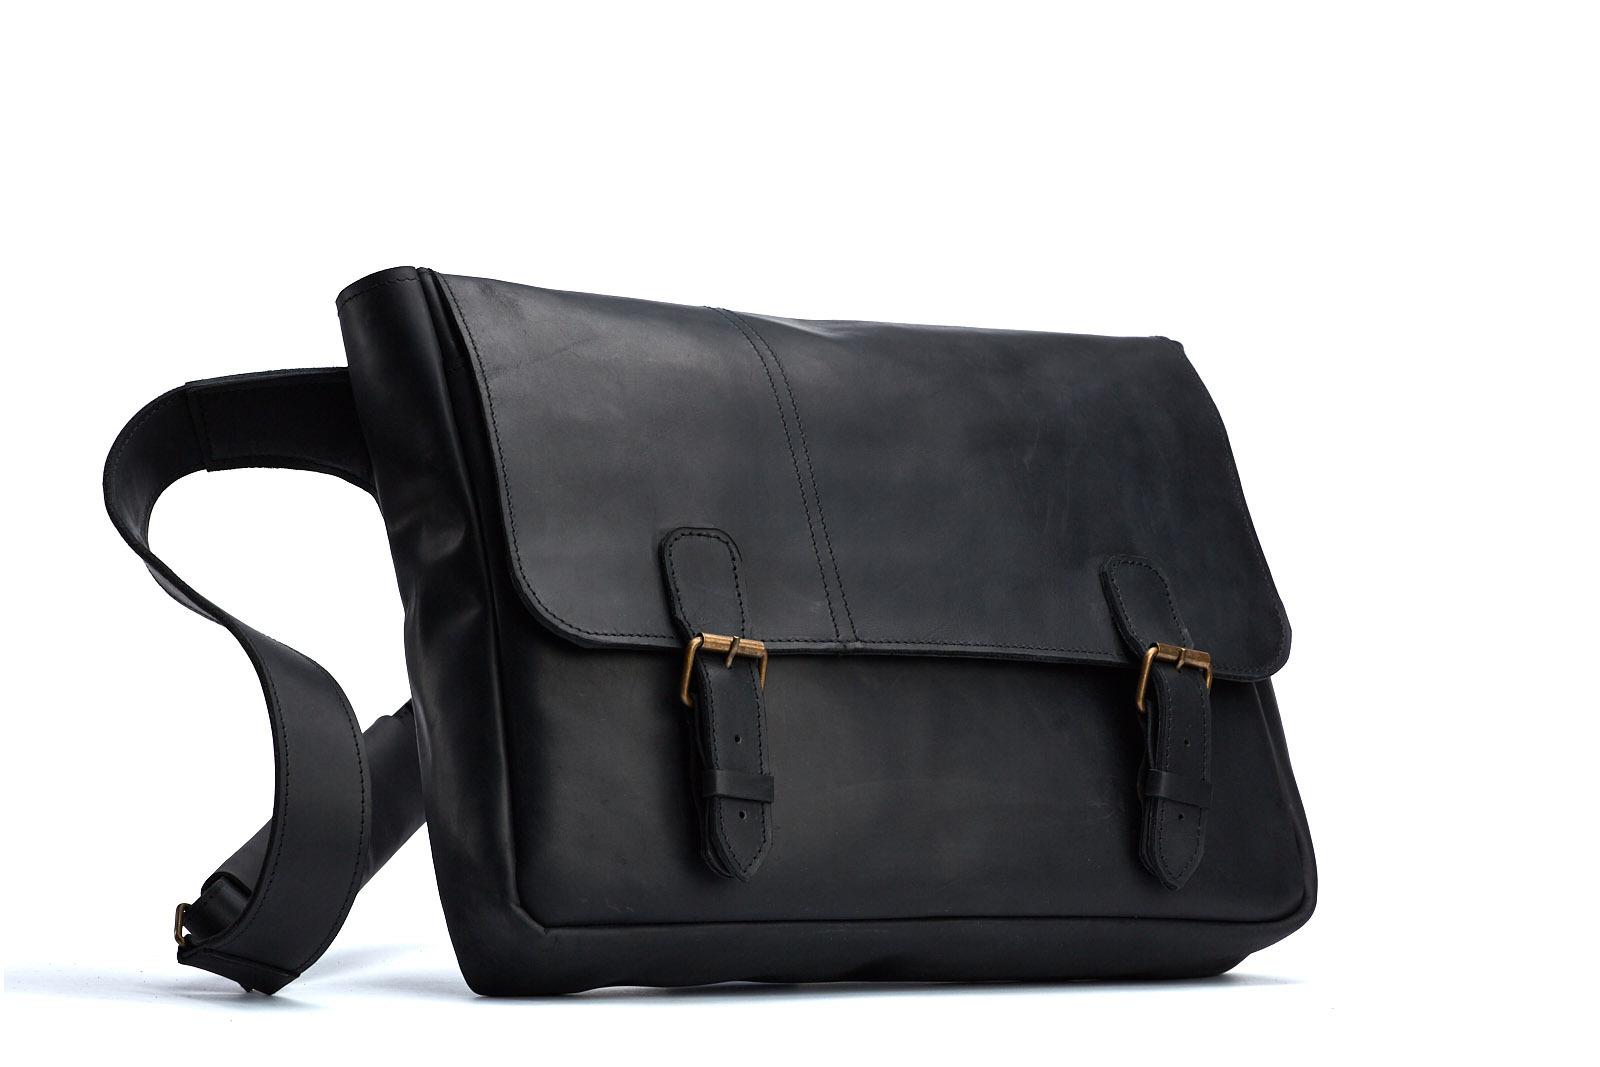 Шкіряна сумка FOREIGNER | Shuflia